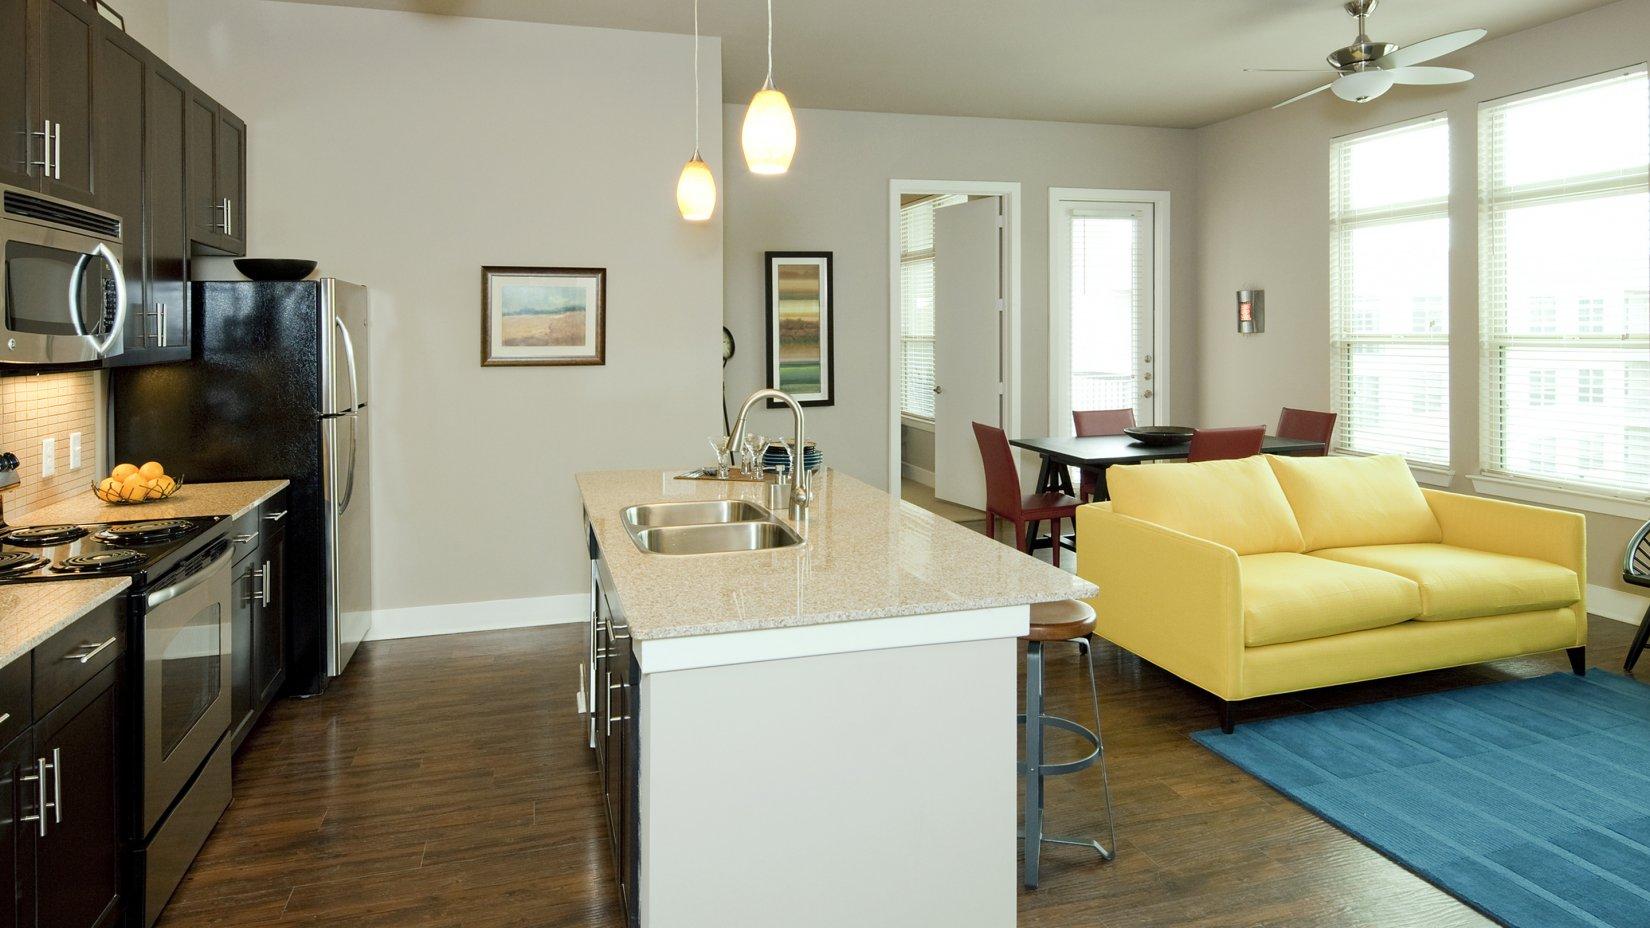 Apartments In San Antonio For Rent Cevallos Lofts